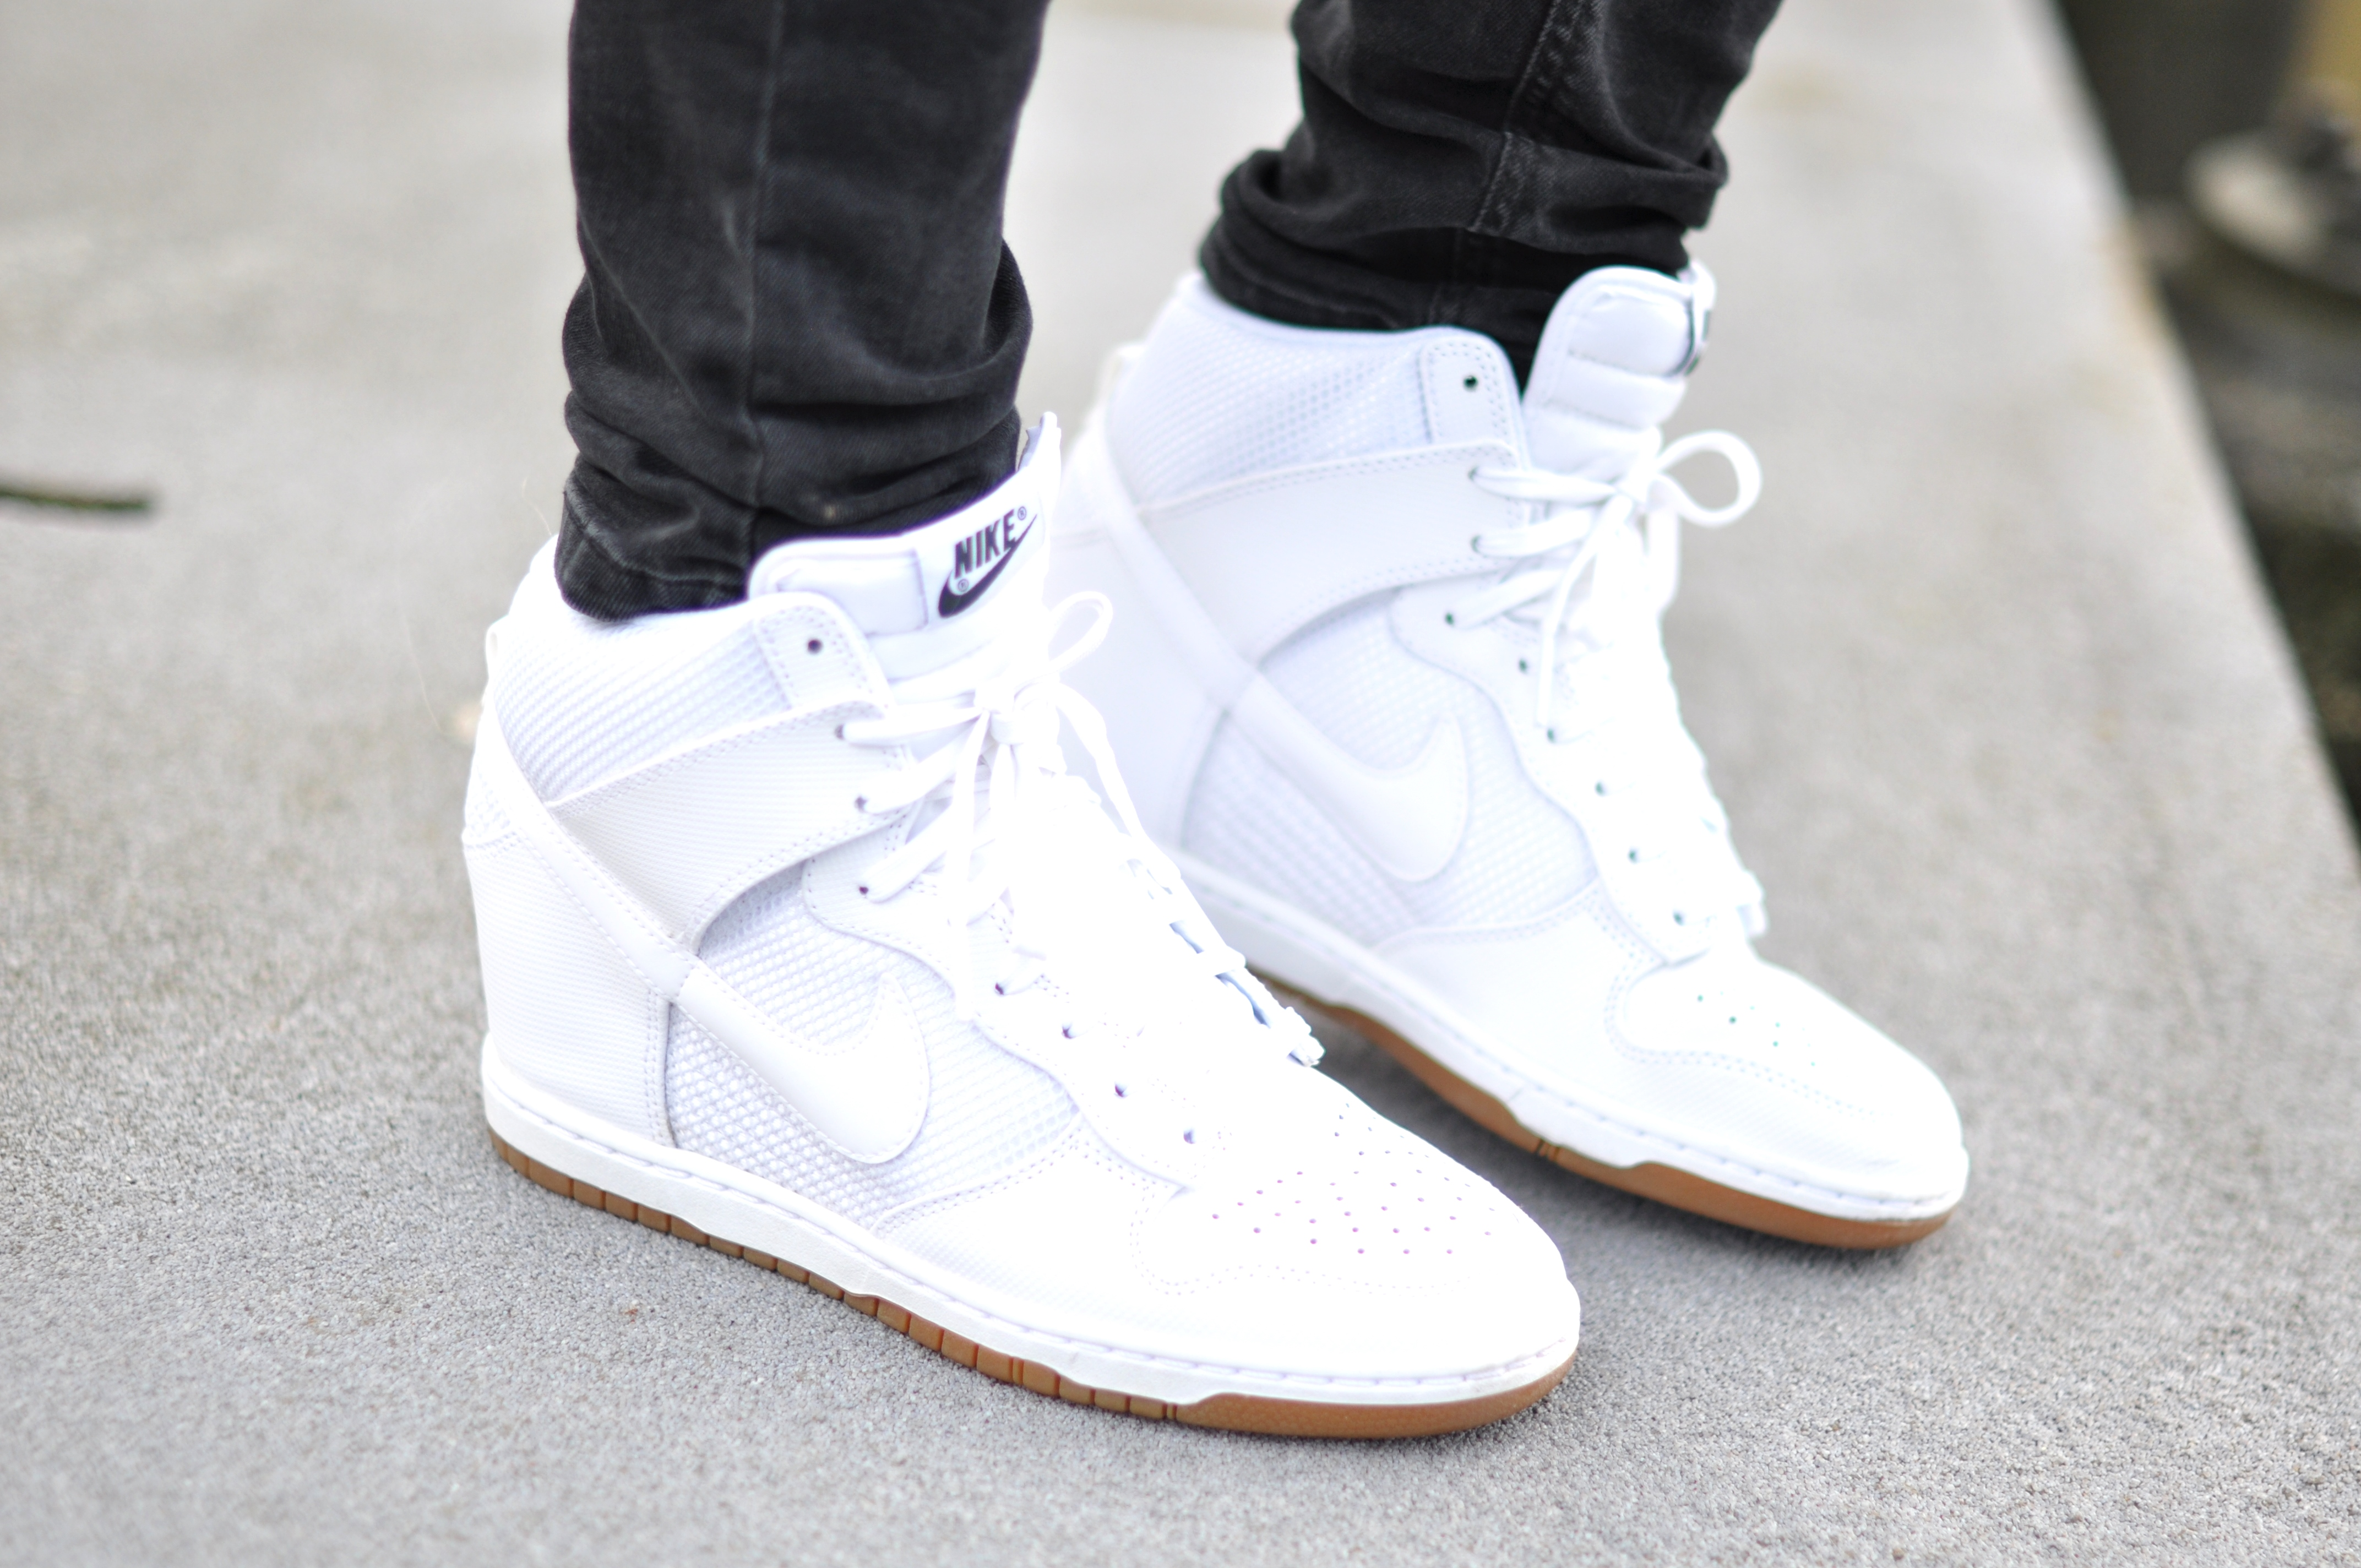 Nike Dunk High White